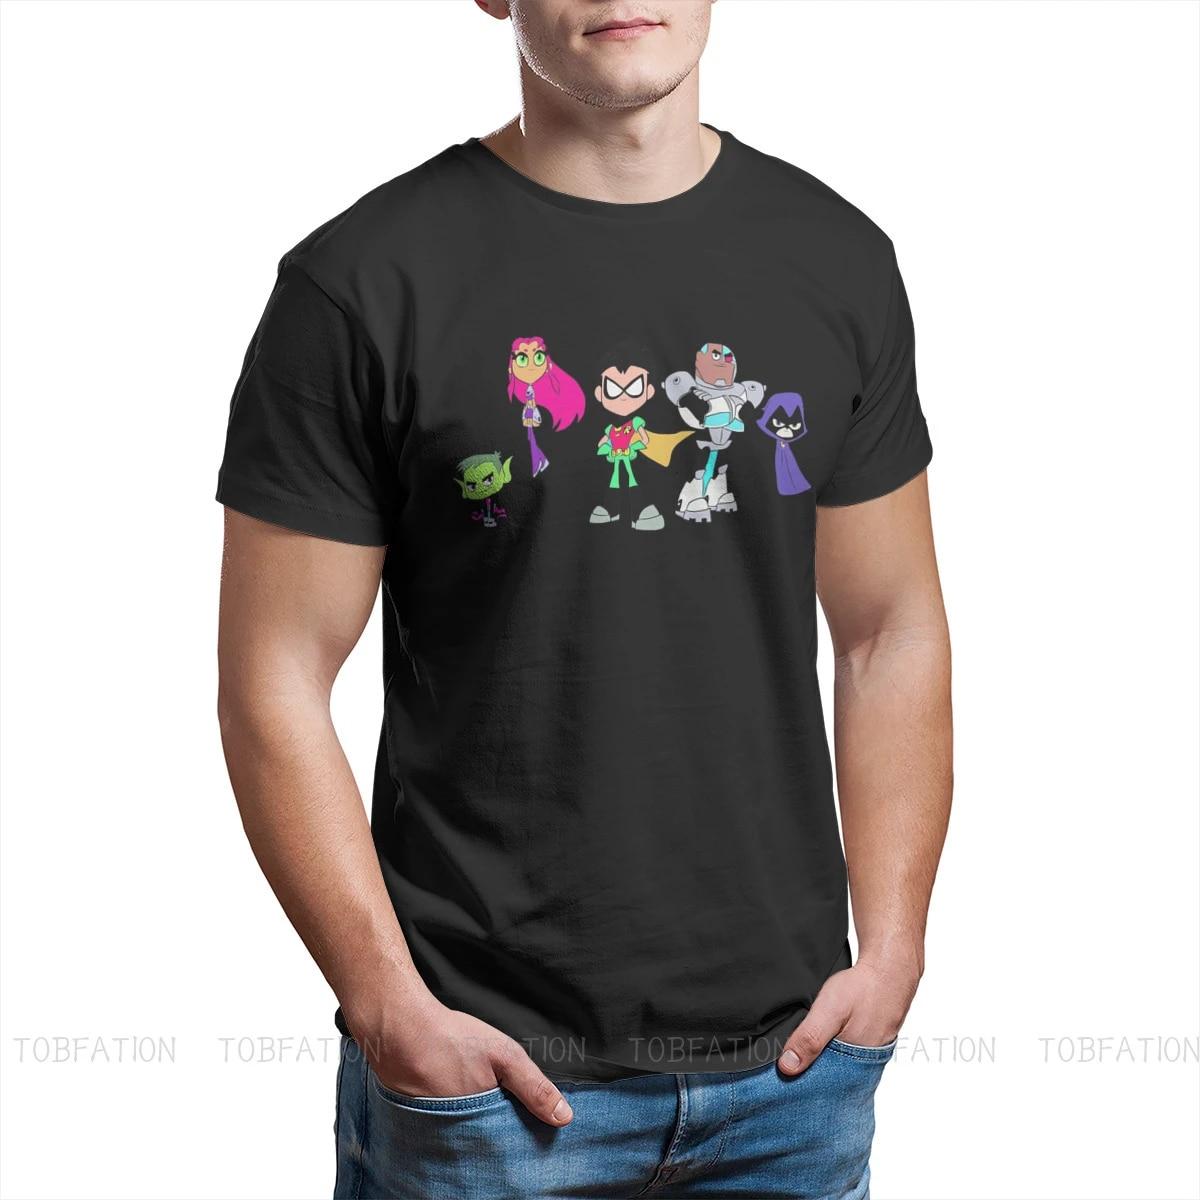 Titans GO Animated Television Series Cute Team Tshirt Black for Men Oversized T Shirt Harajuku Men's Tops Tee